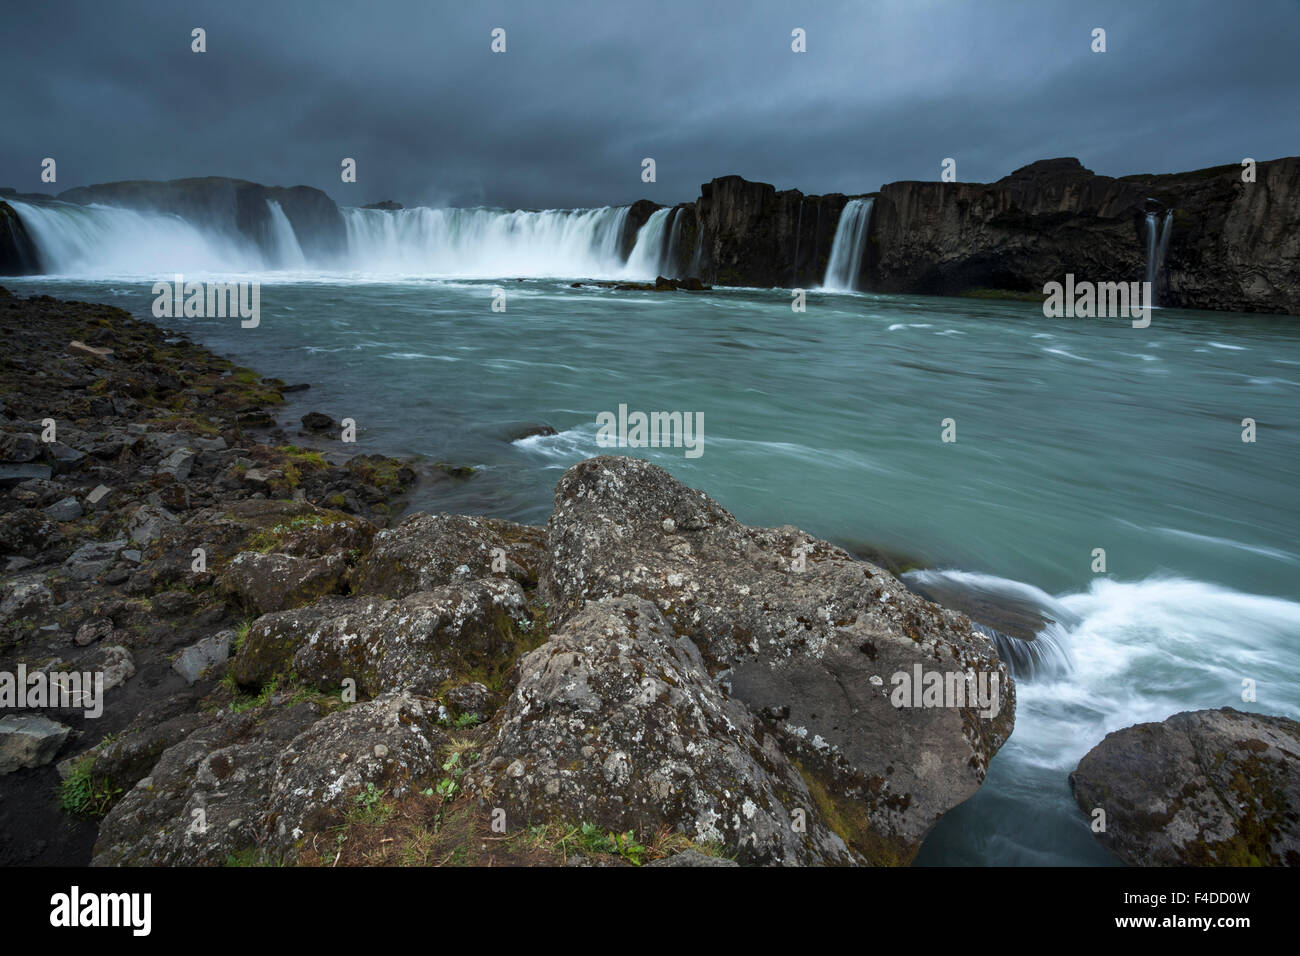 Godafoss waterfall and Skjalfandafljot river, Nordhurland Eystra, Iceland. - Stock Image